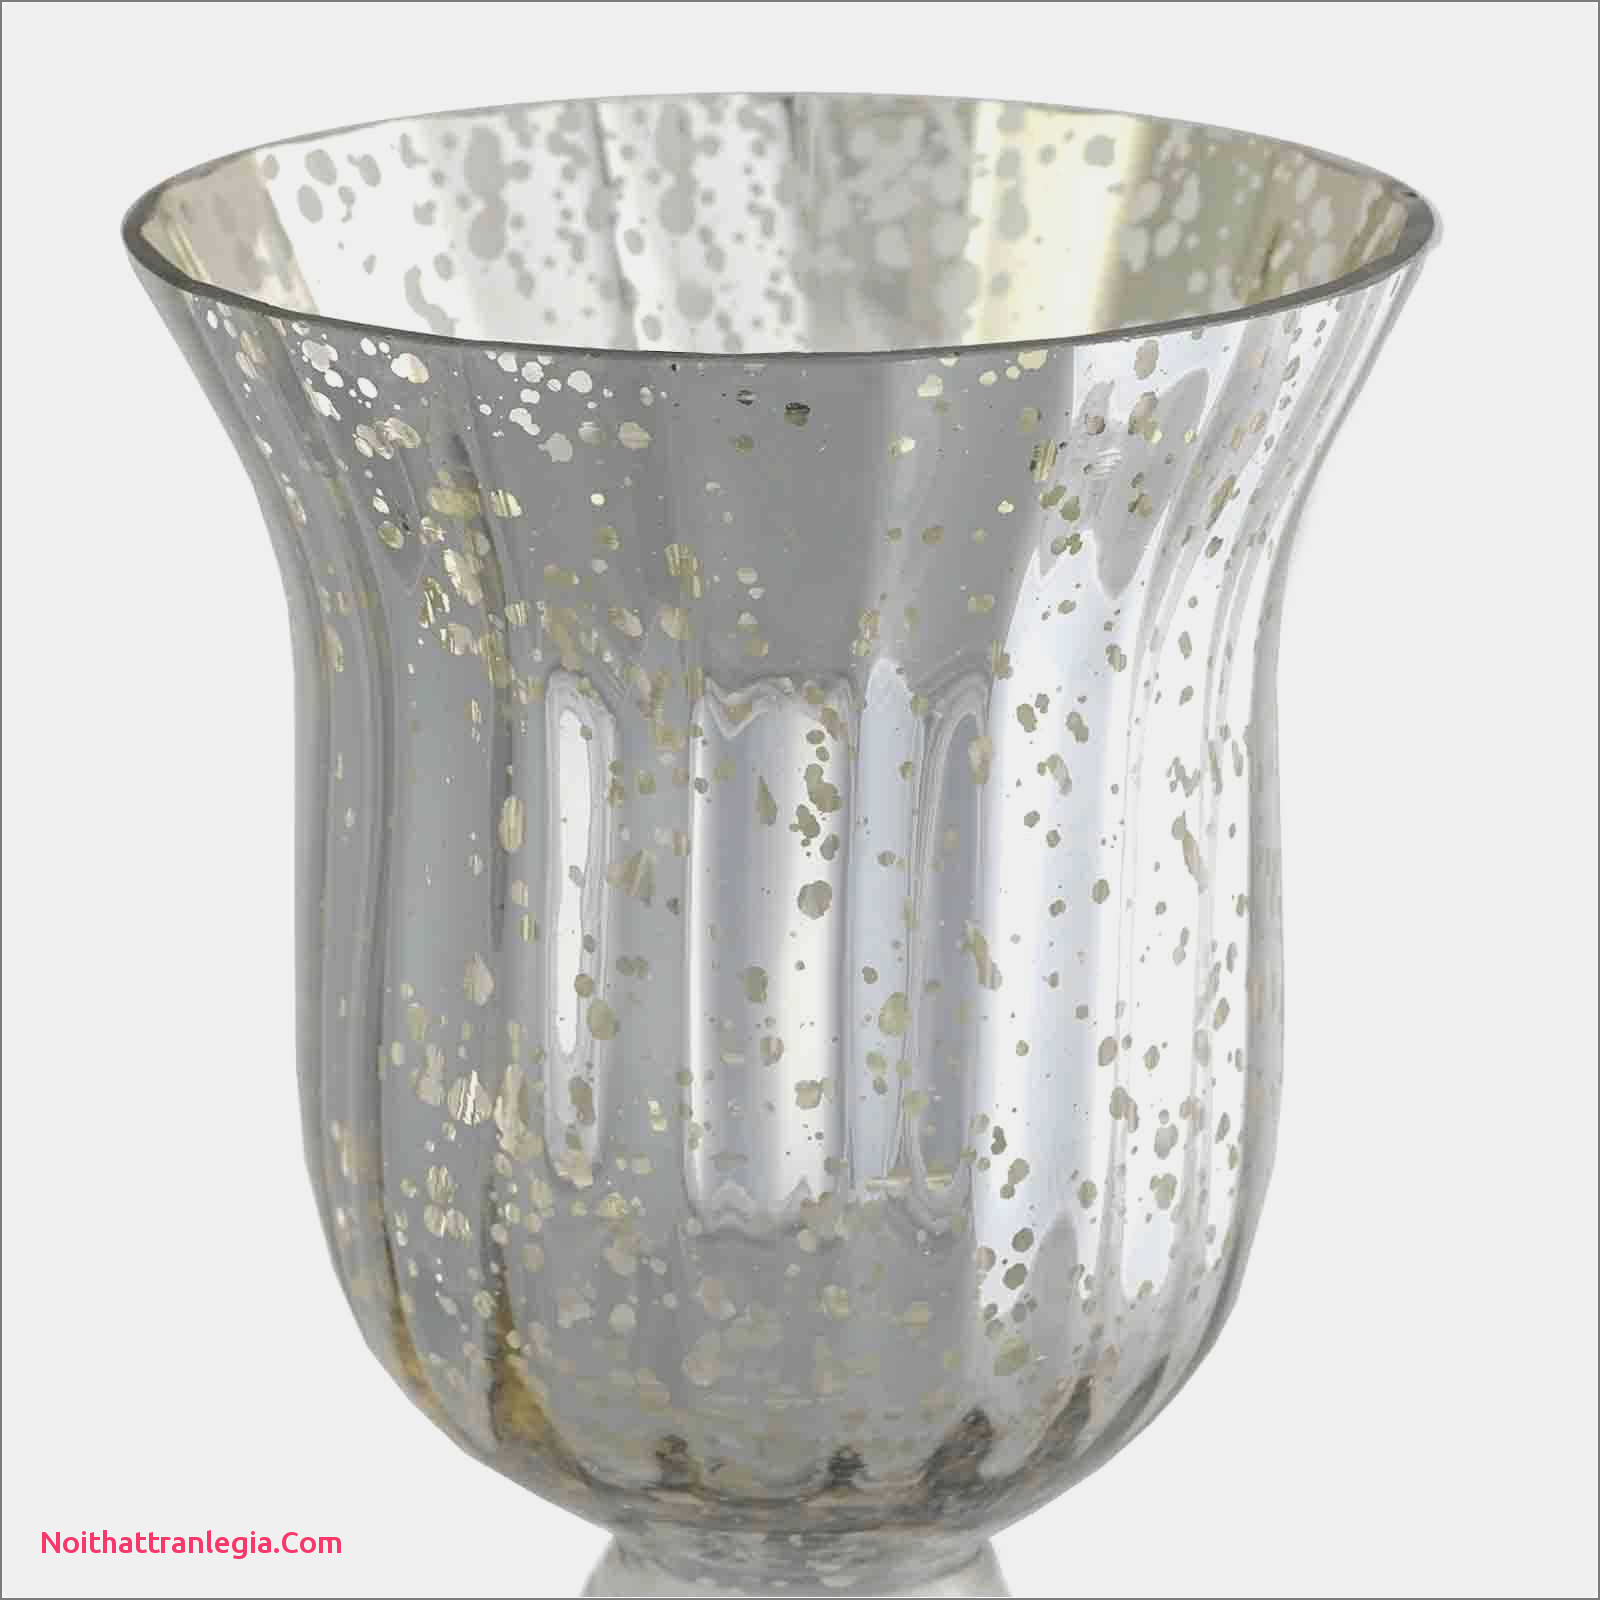 Small Vintage Vases Bulk Of 20 Wedding Vases Noithattranlegia Vases Design with Regard to Wedding Guest Gift Ideas Inspirational Candles for Wedding Favors Superb Pe S5h Vases Candle Vase I